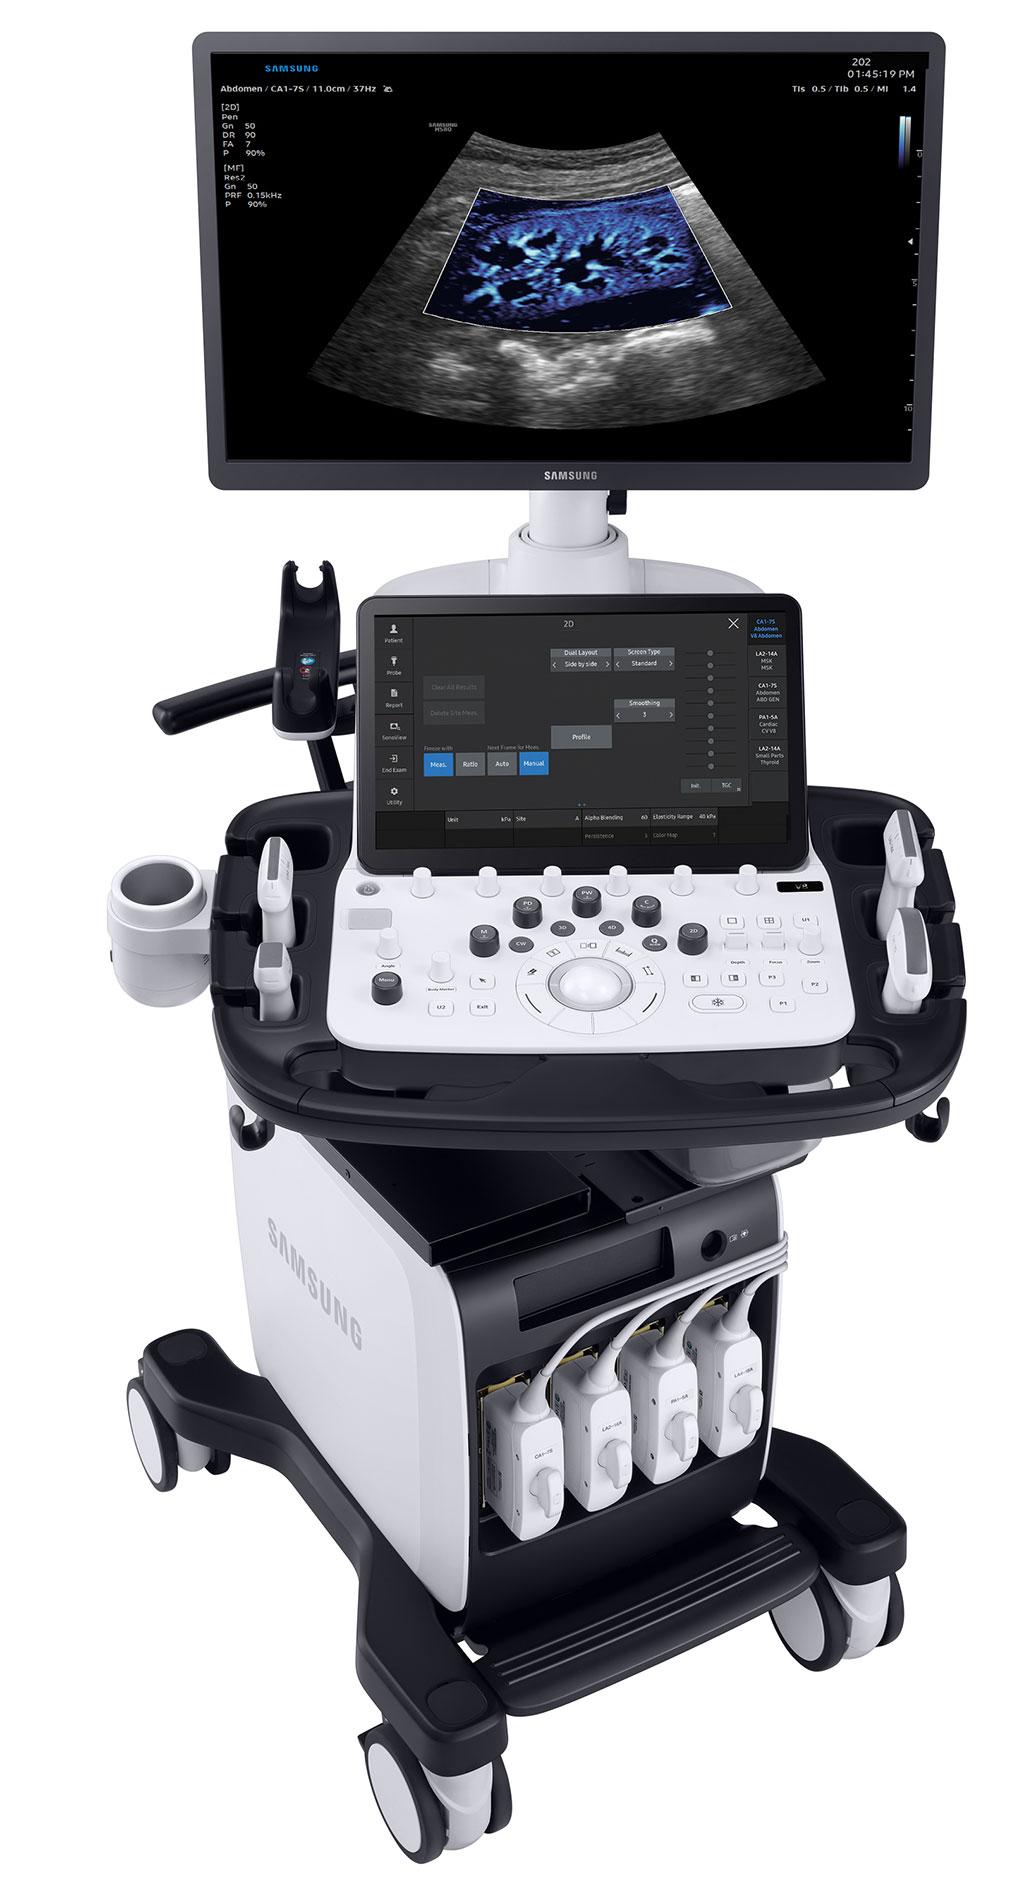 Image: V8 high-end ultrasound system (Photo courtesy of Samsung Electronics Co., Ltd.)